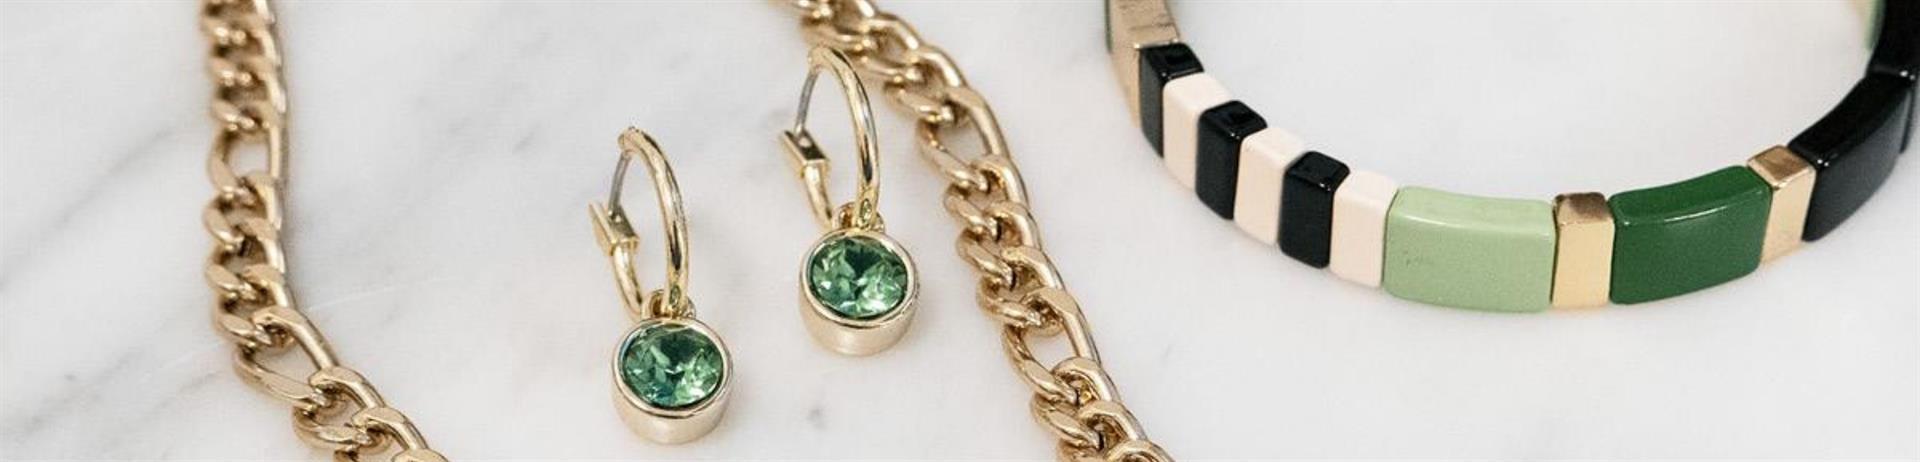 Askepott Interiør - smykker